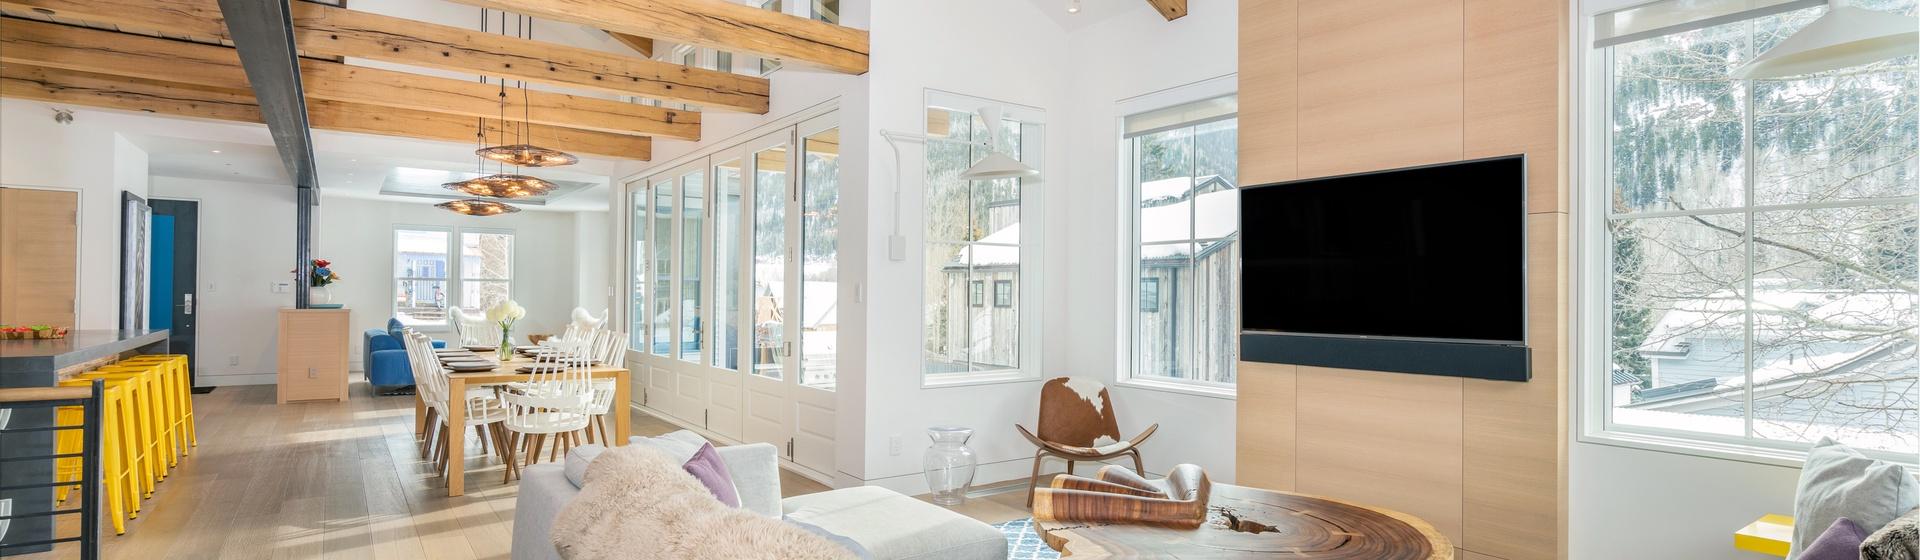 5-Telluride-The-Sunnyside-Living-West-to-Dining-Web.jpg